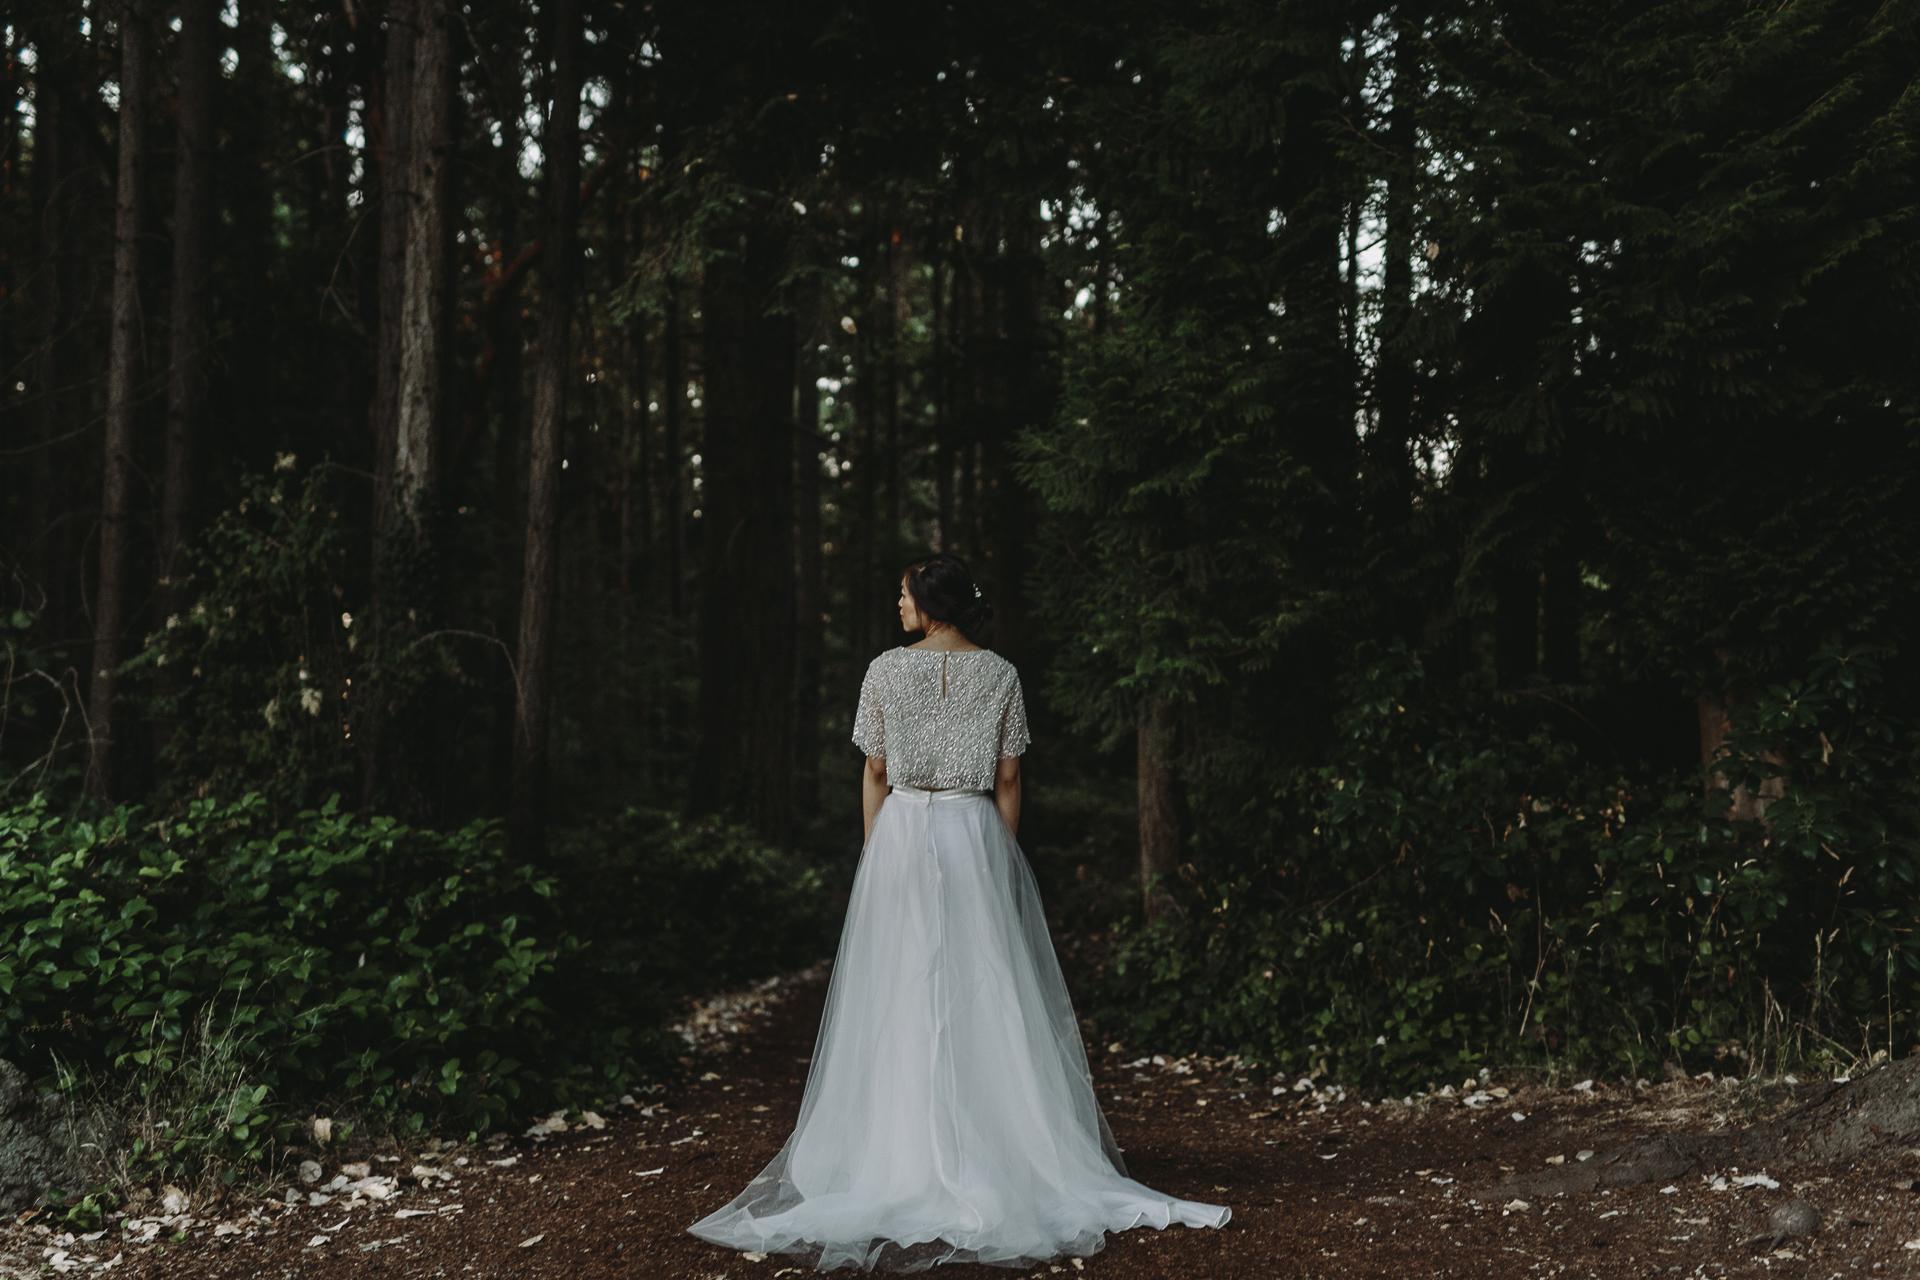 jess-hunter-seattle-artistic-wedding-photographer-5950.jpg